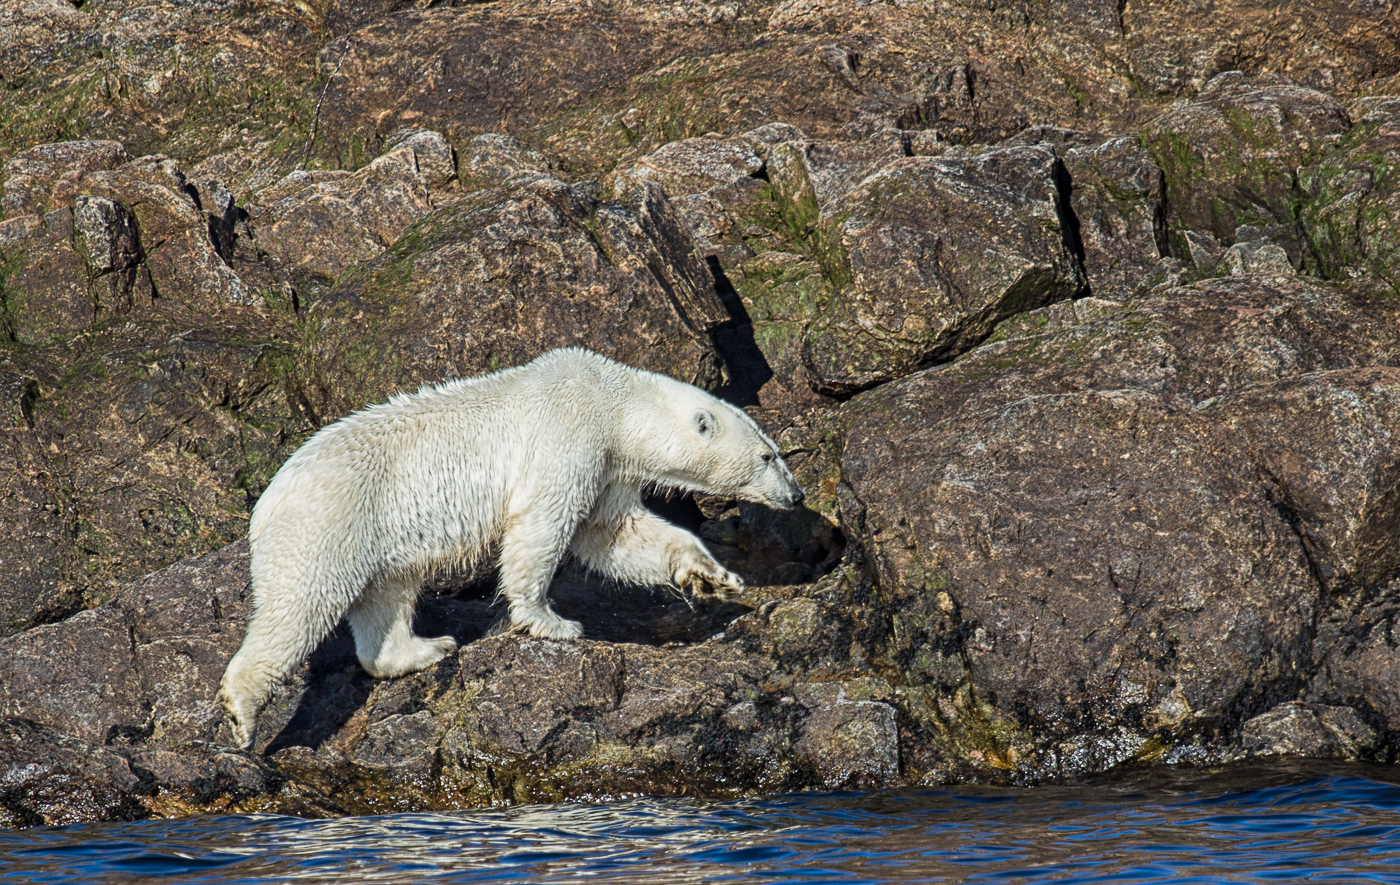 Polar bear at the Lower Savage Islands, Canada